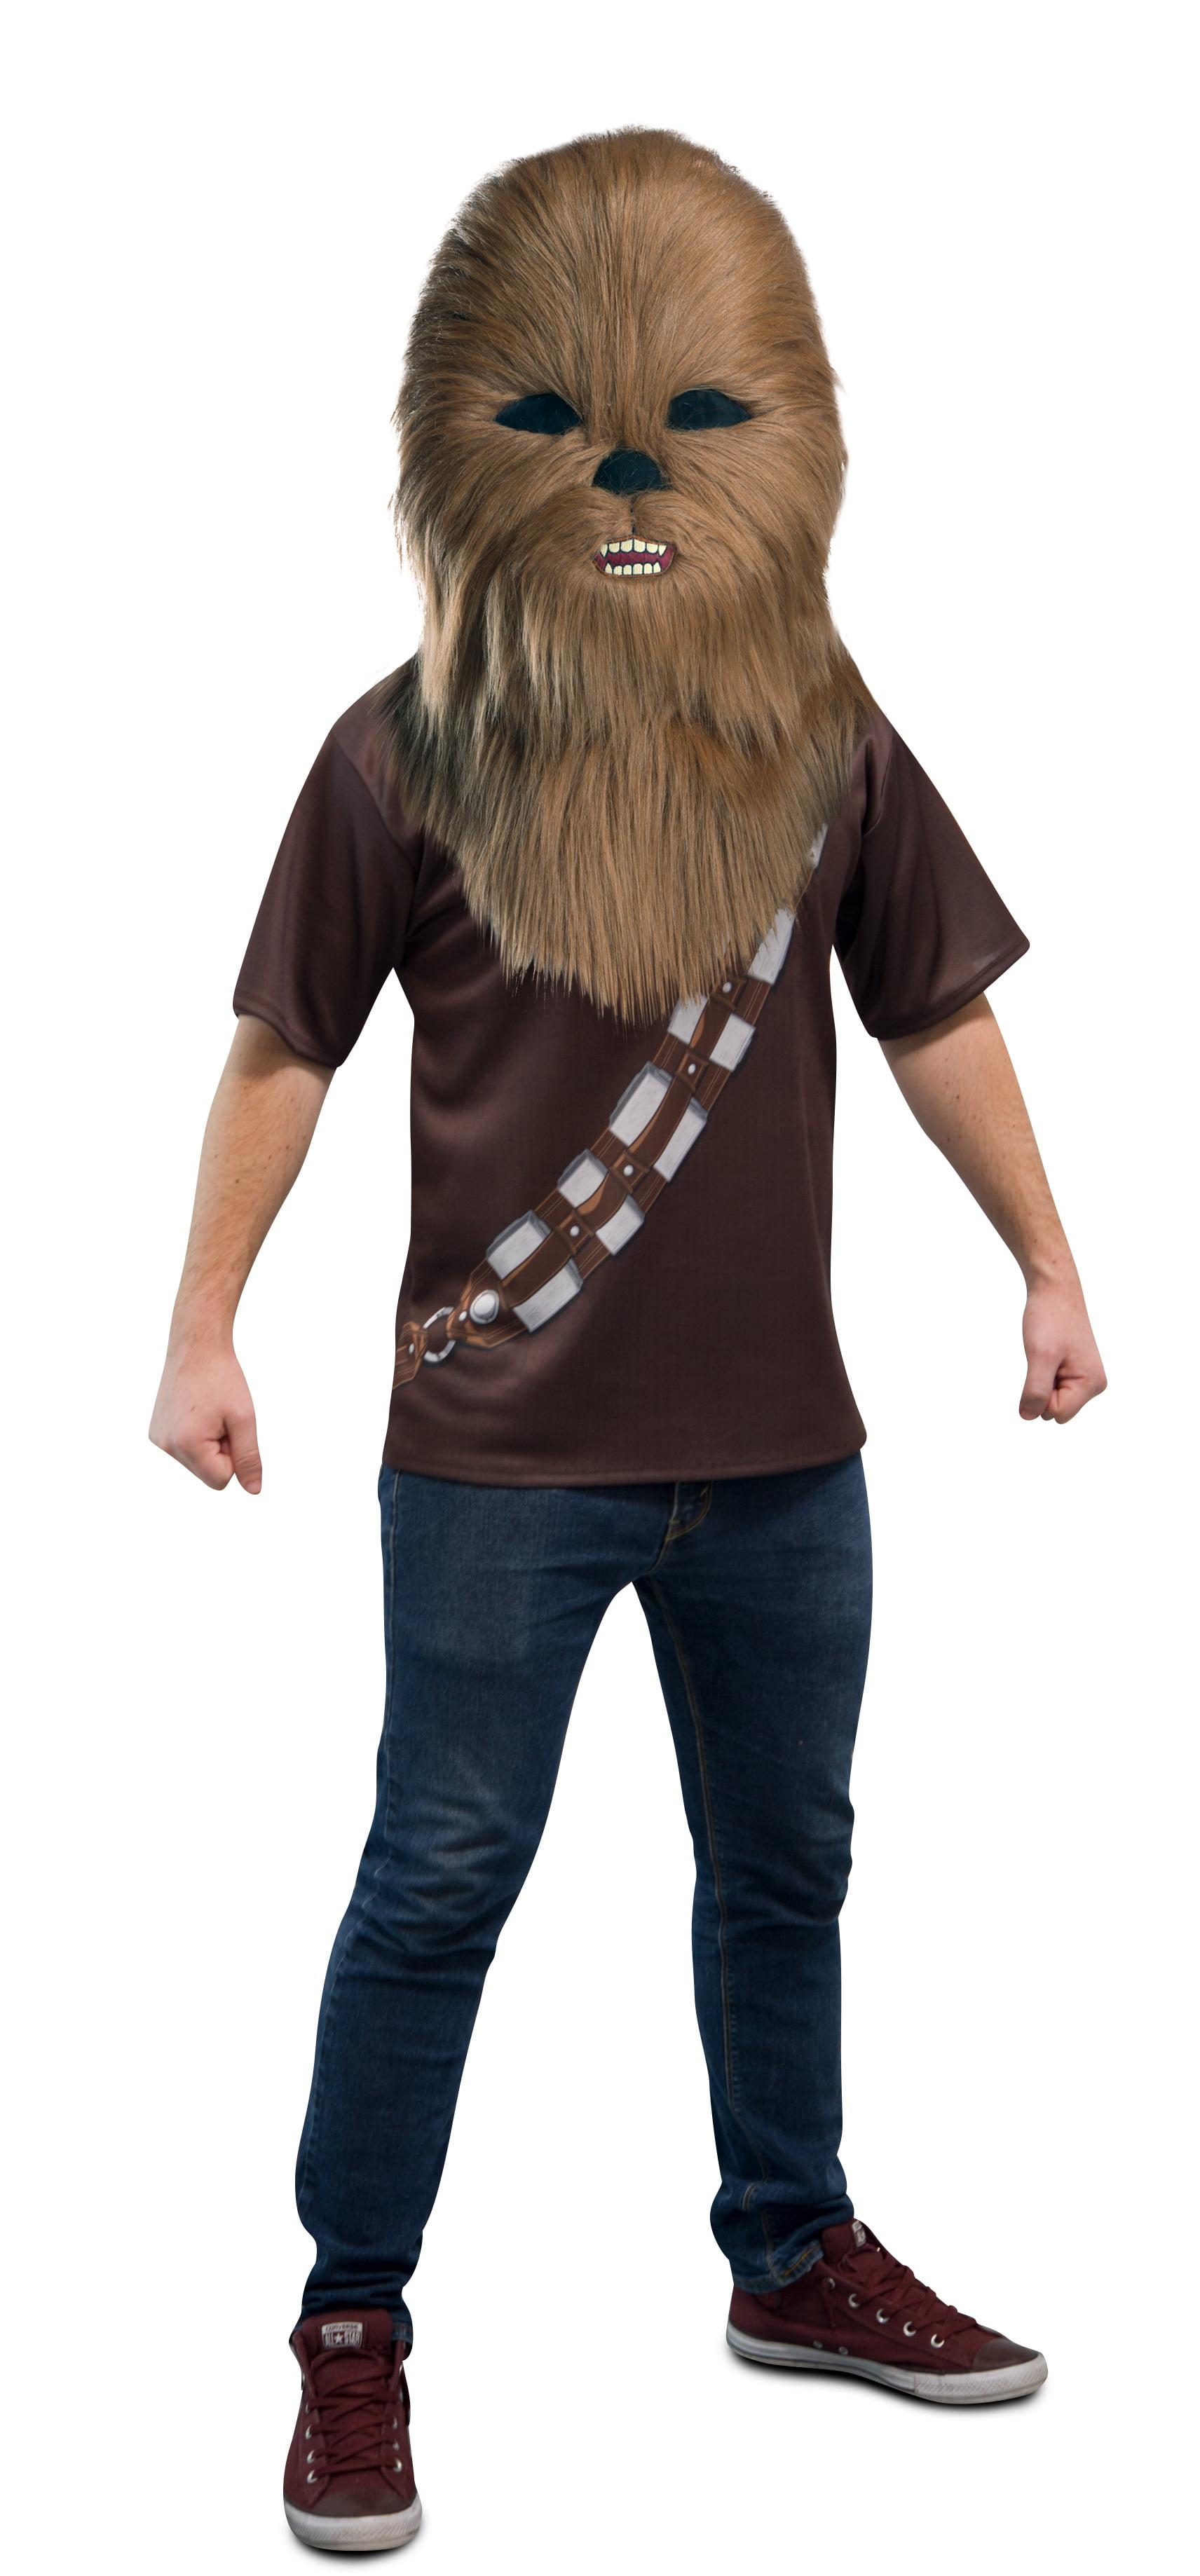 Chewbacca costume adult professional